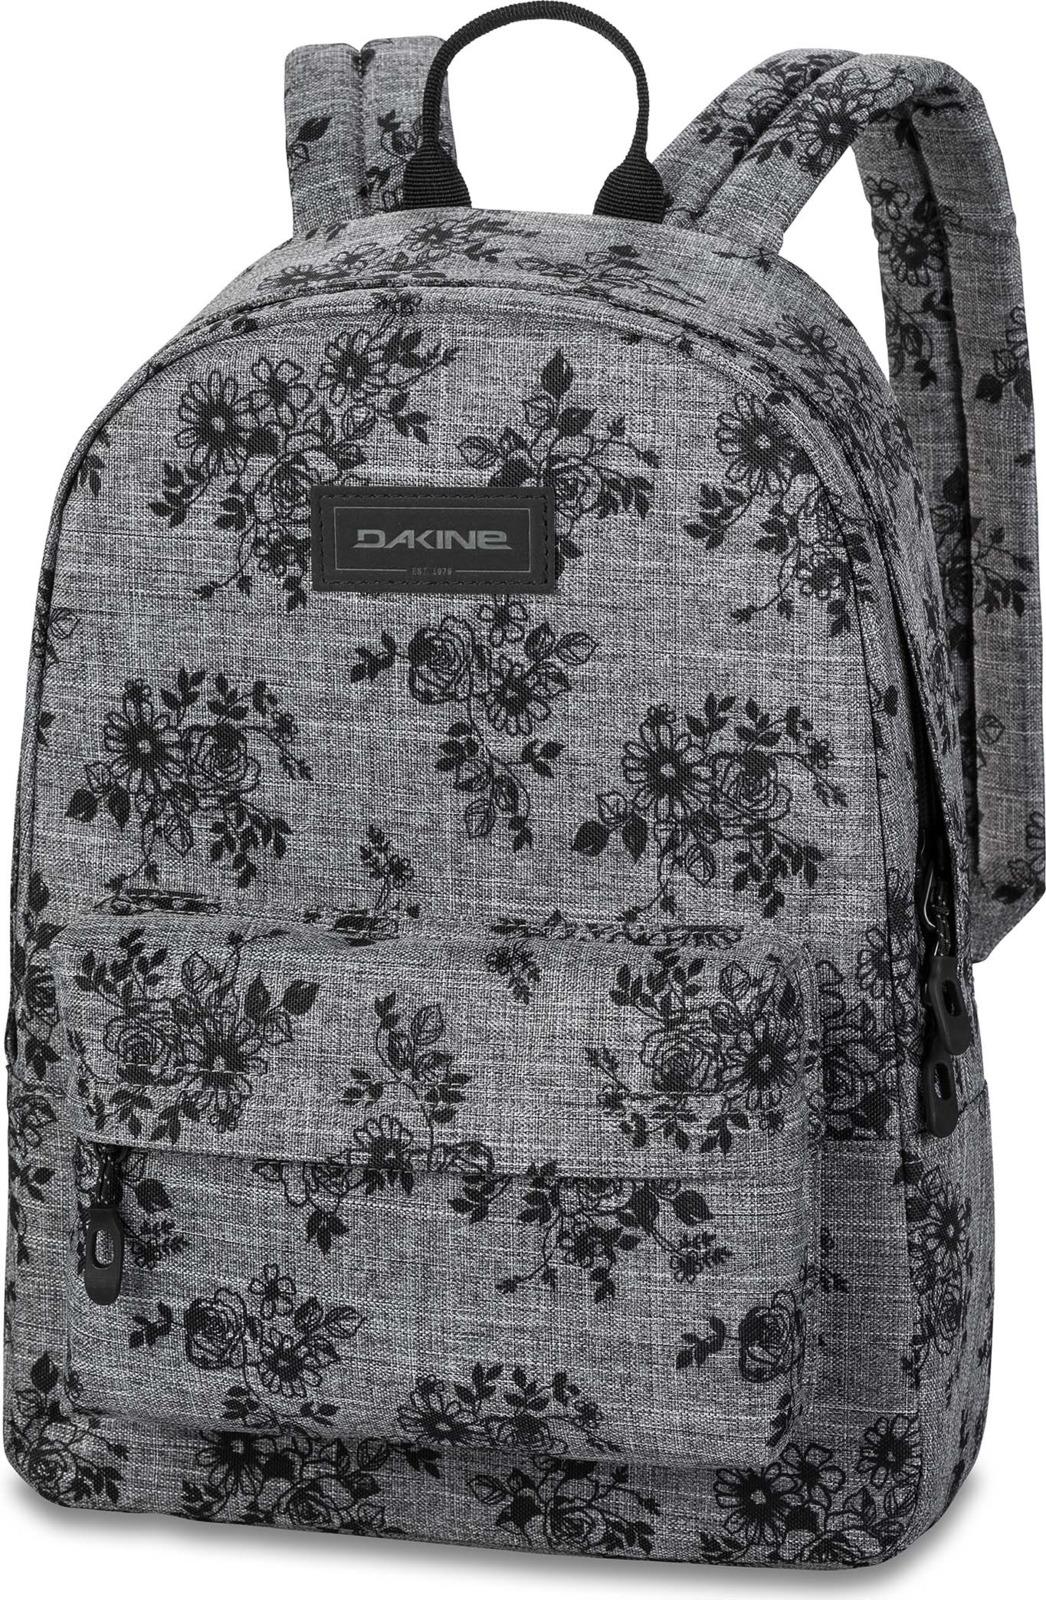 Рюкзак Dakine 365 Mini, цвет: серый, 12 л цена